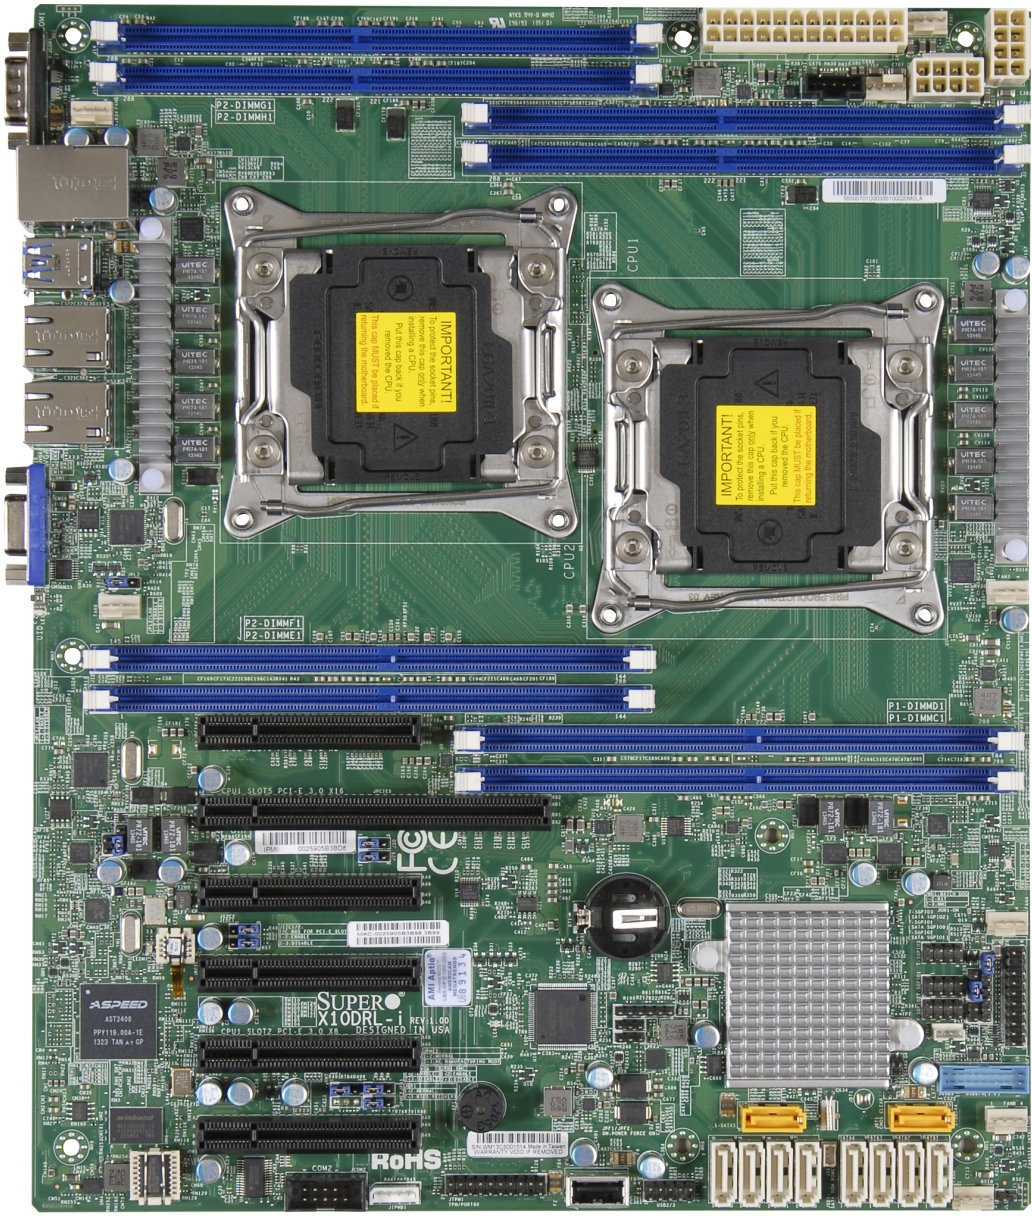 Supermicro X10DRL-i - ocf81 - Userreviews - Tweakers